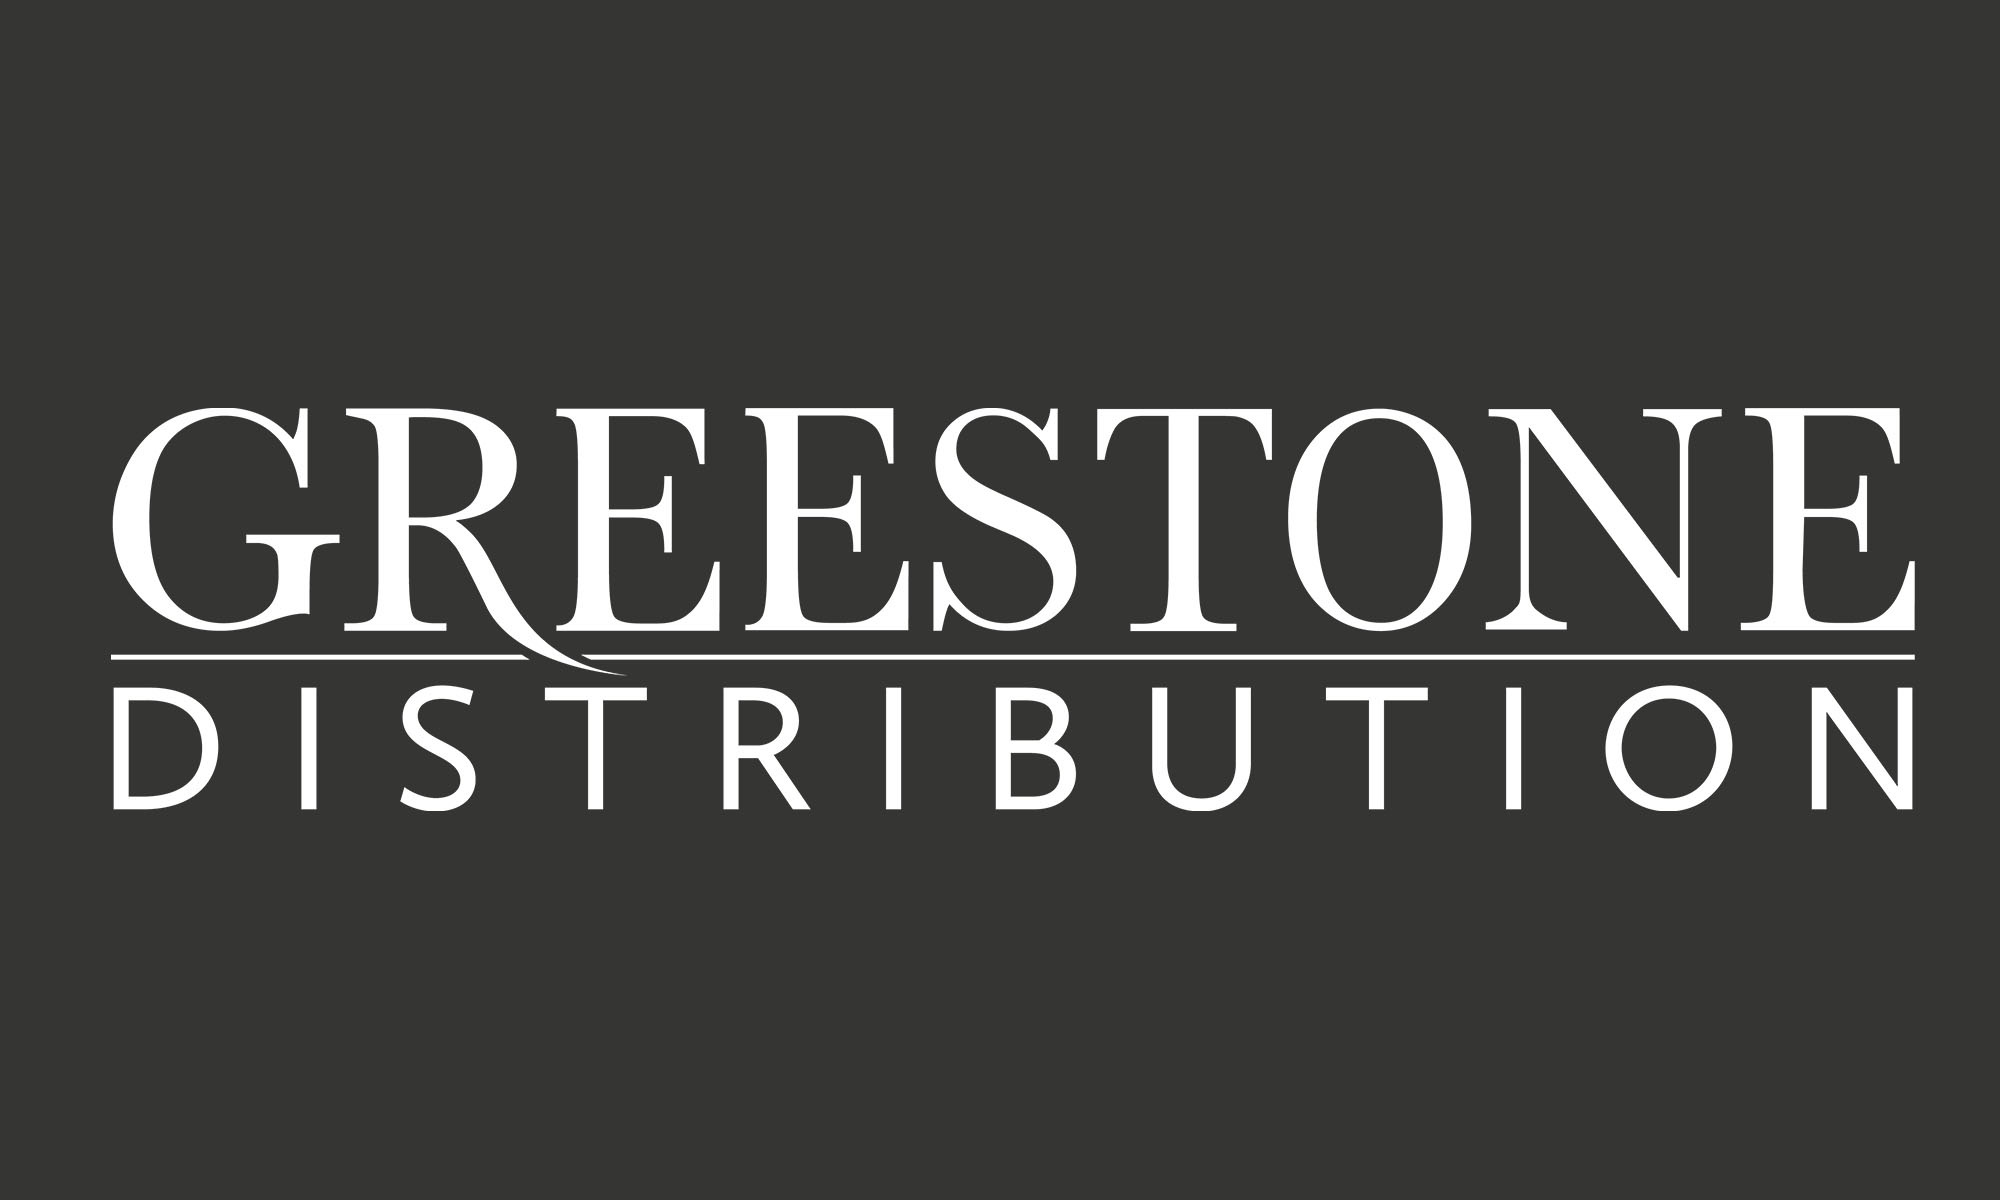 Greestone Distribution